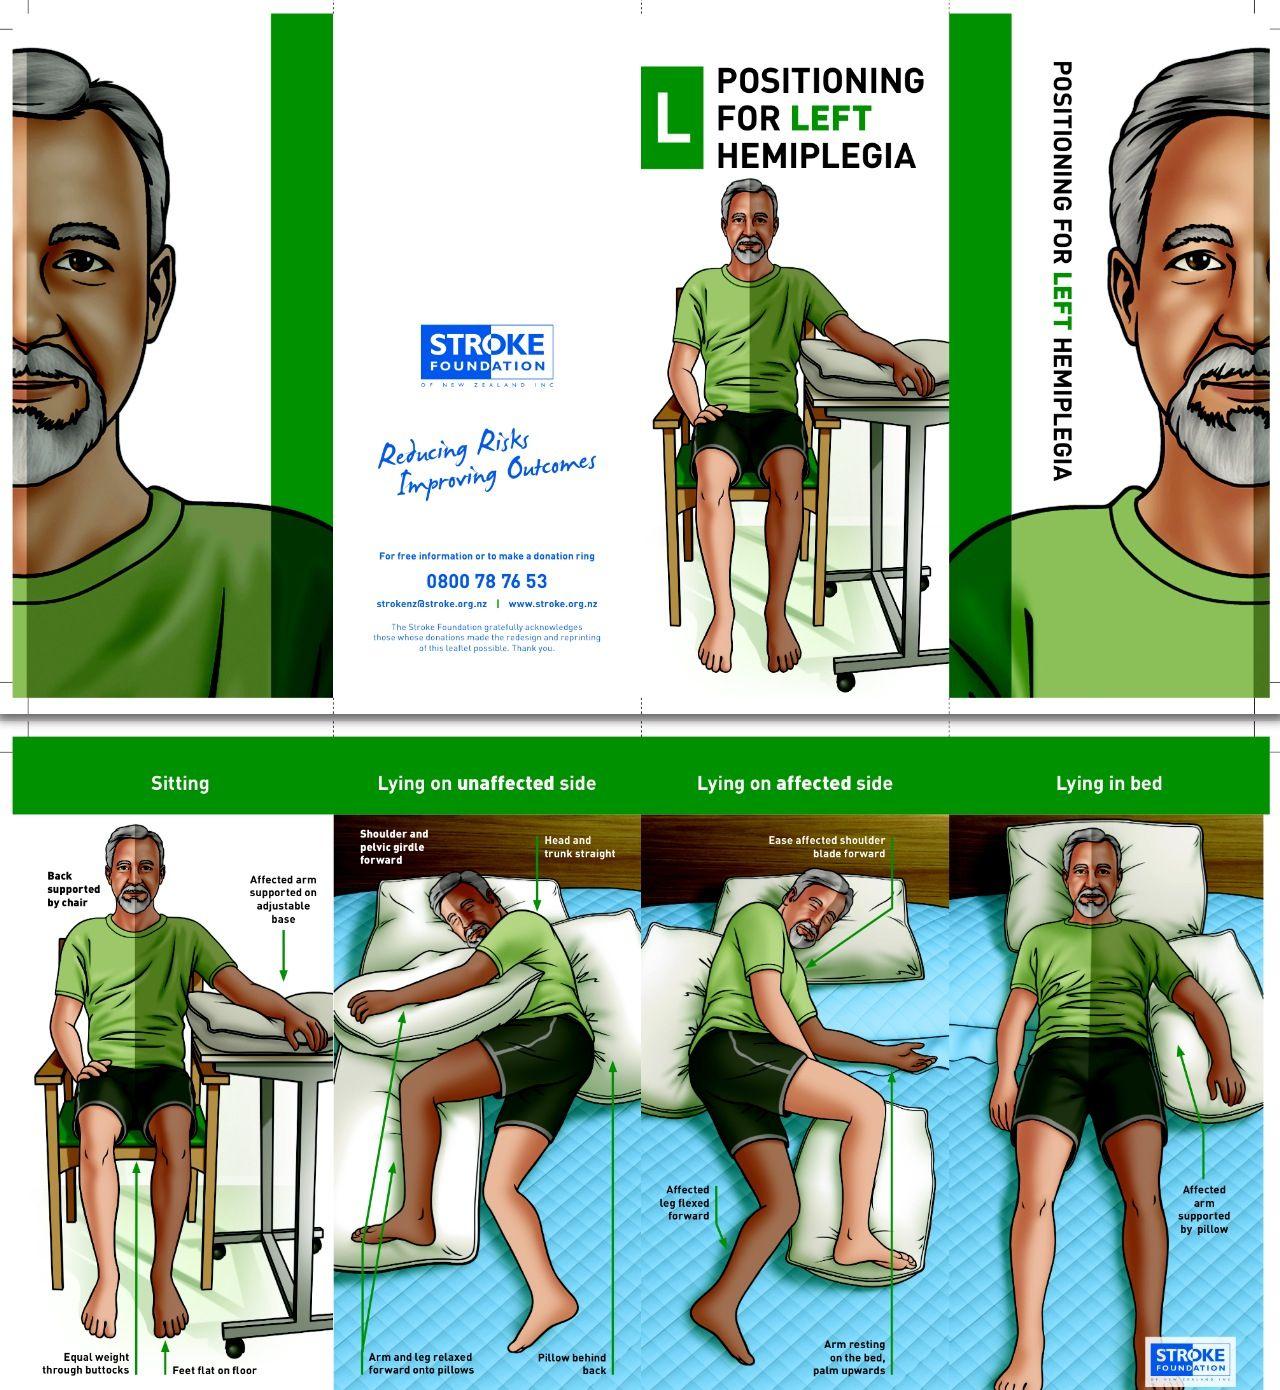 Stroke Patient Education Positioning For Left Hemiplegia